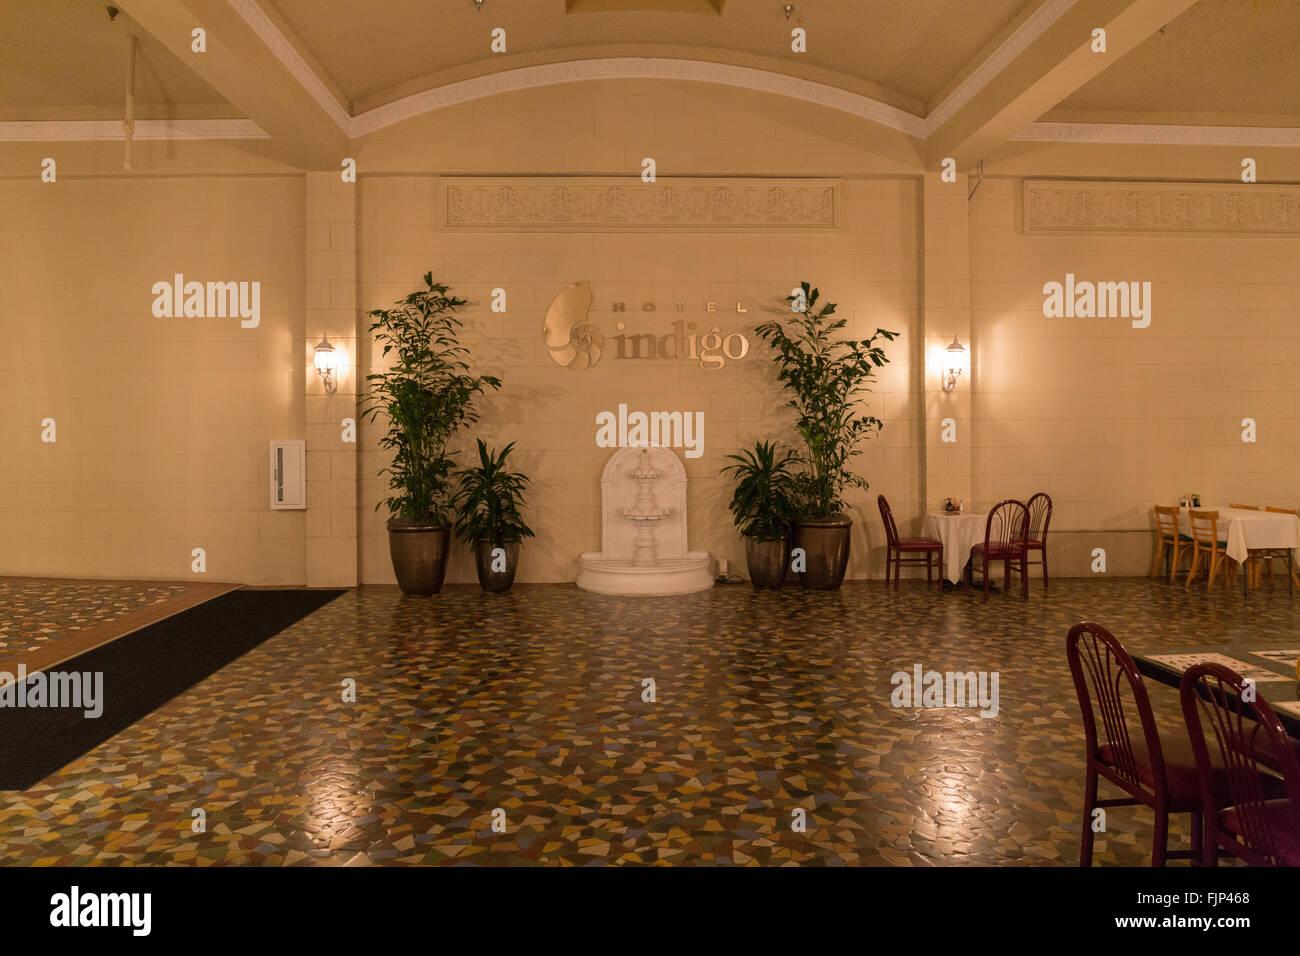 The entrance lobby of the Hotel Indigo Fort Myers Florida - Stock Image